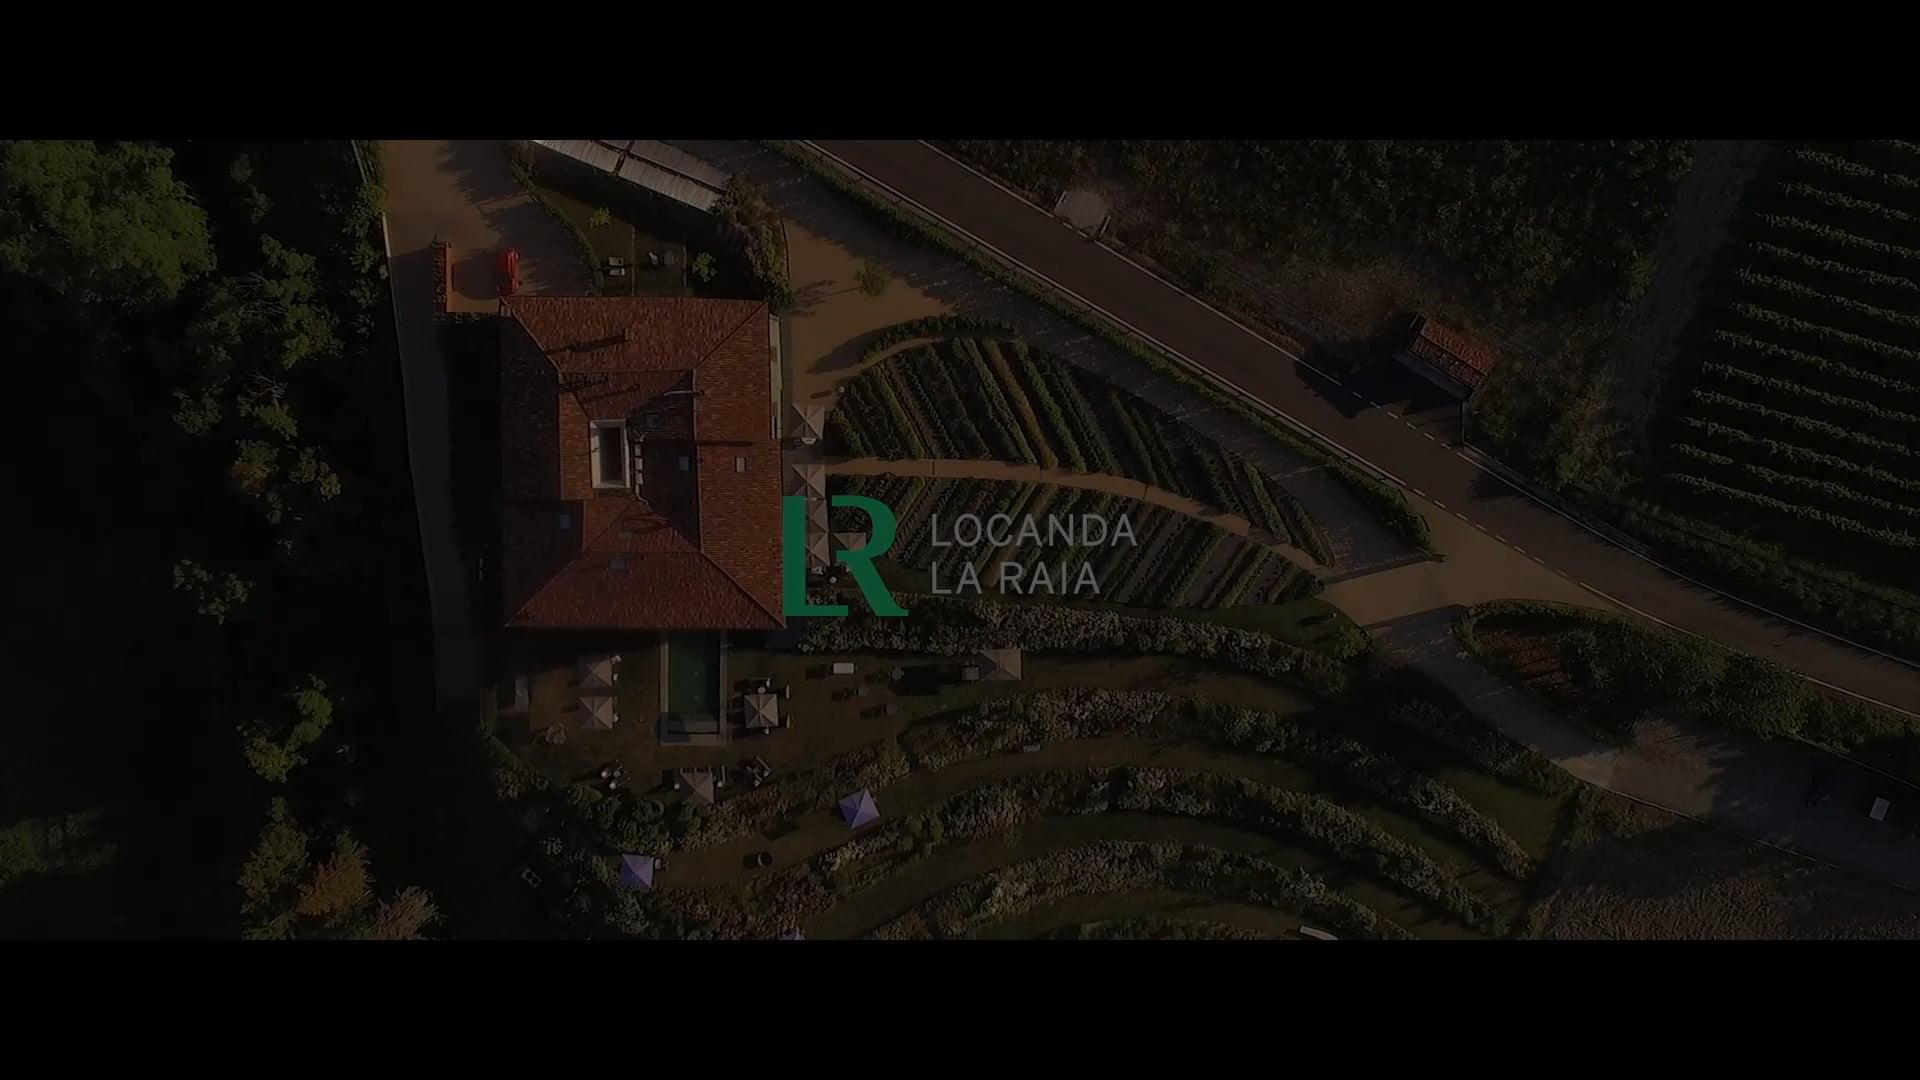 LOCANDA LA RAIA